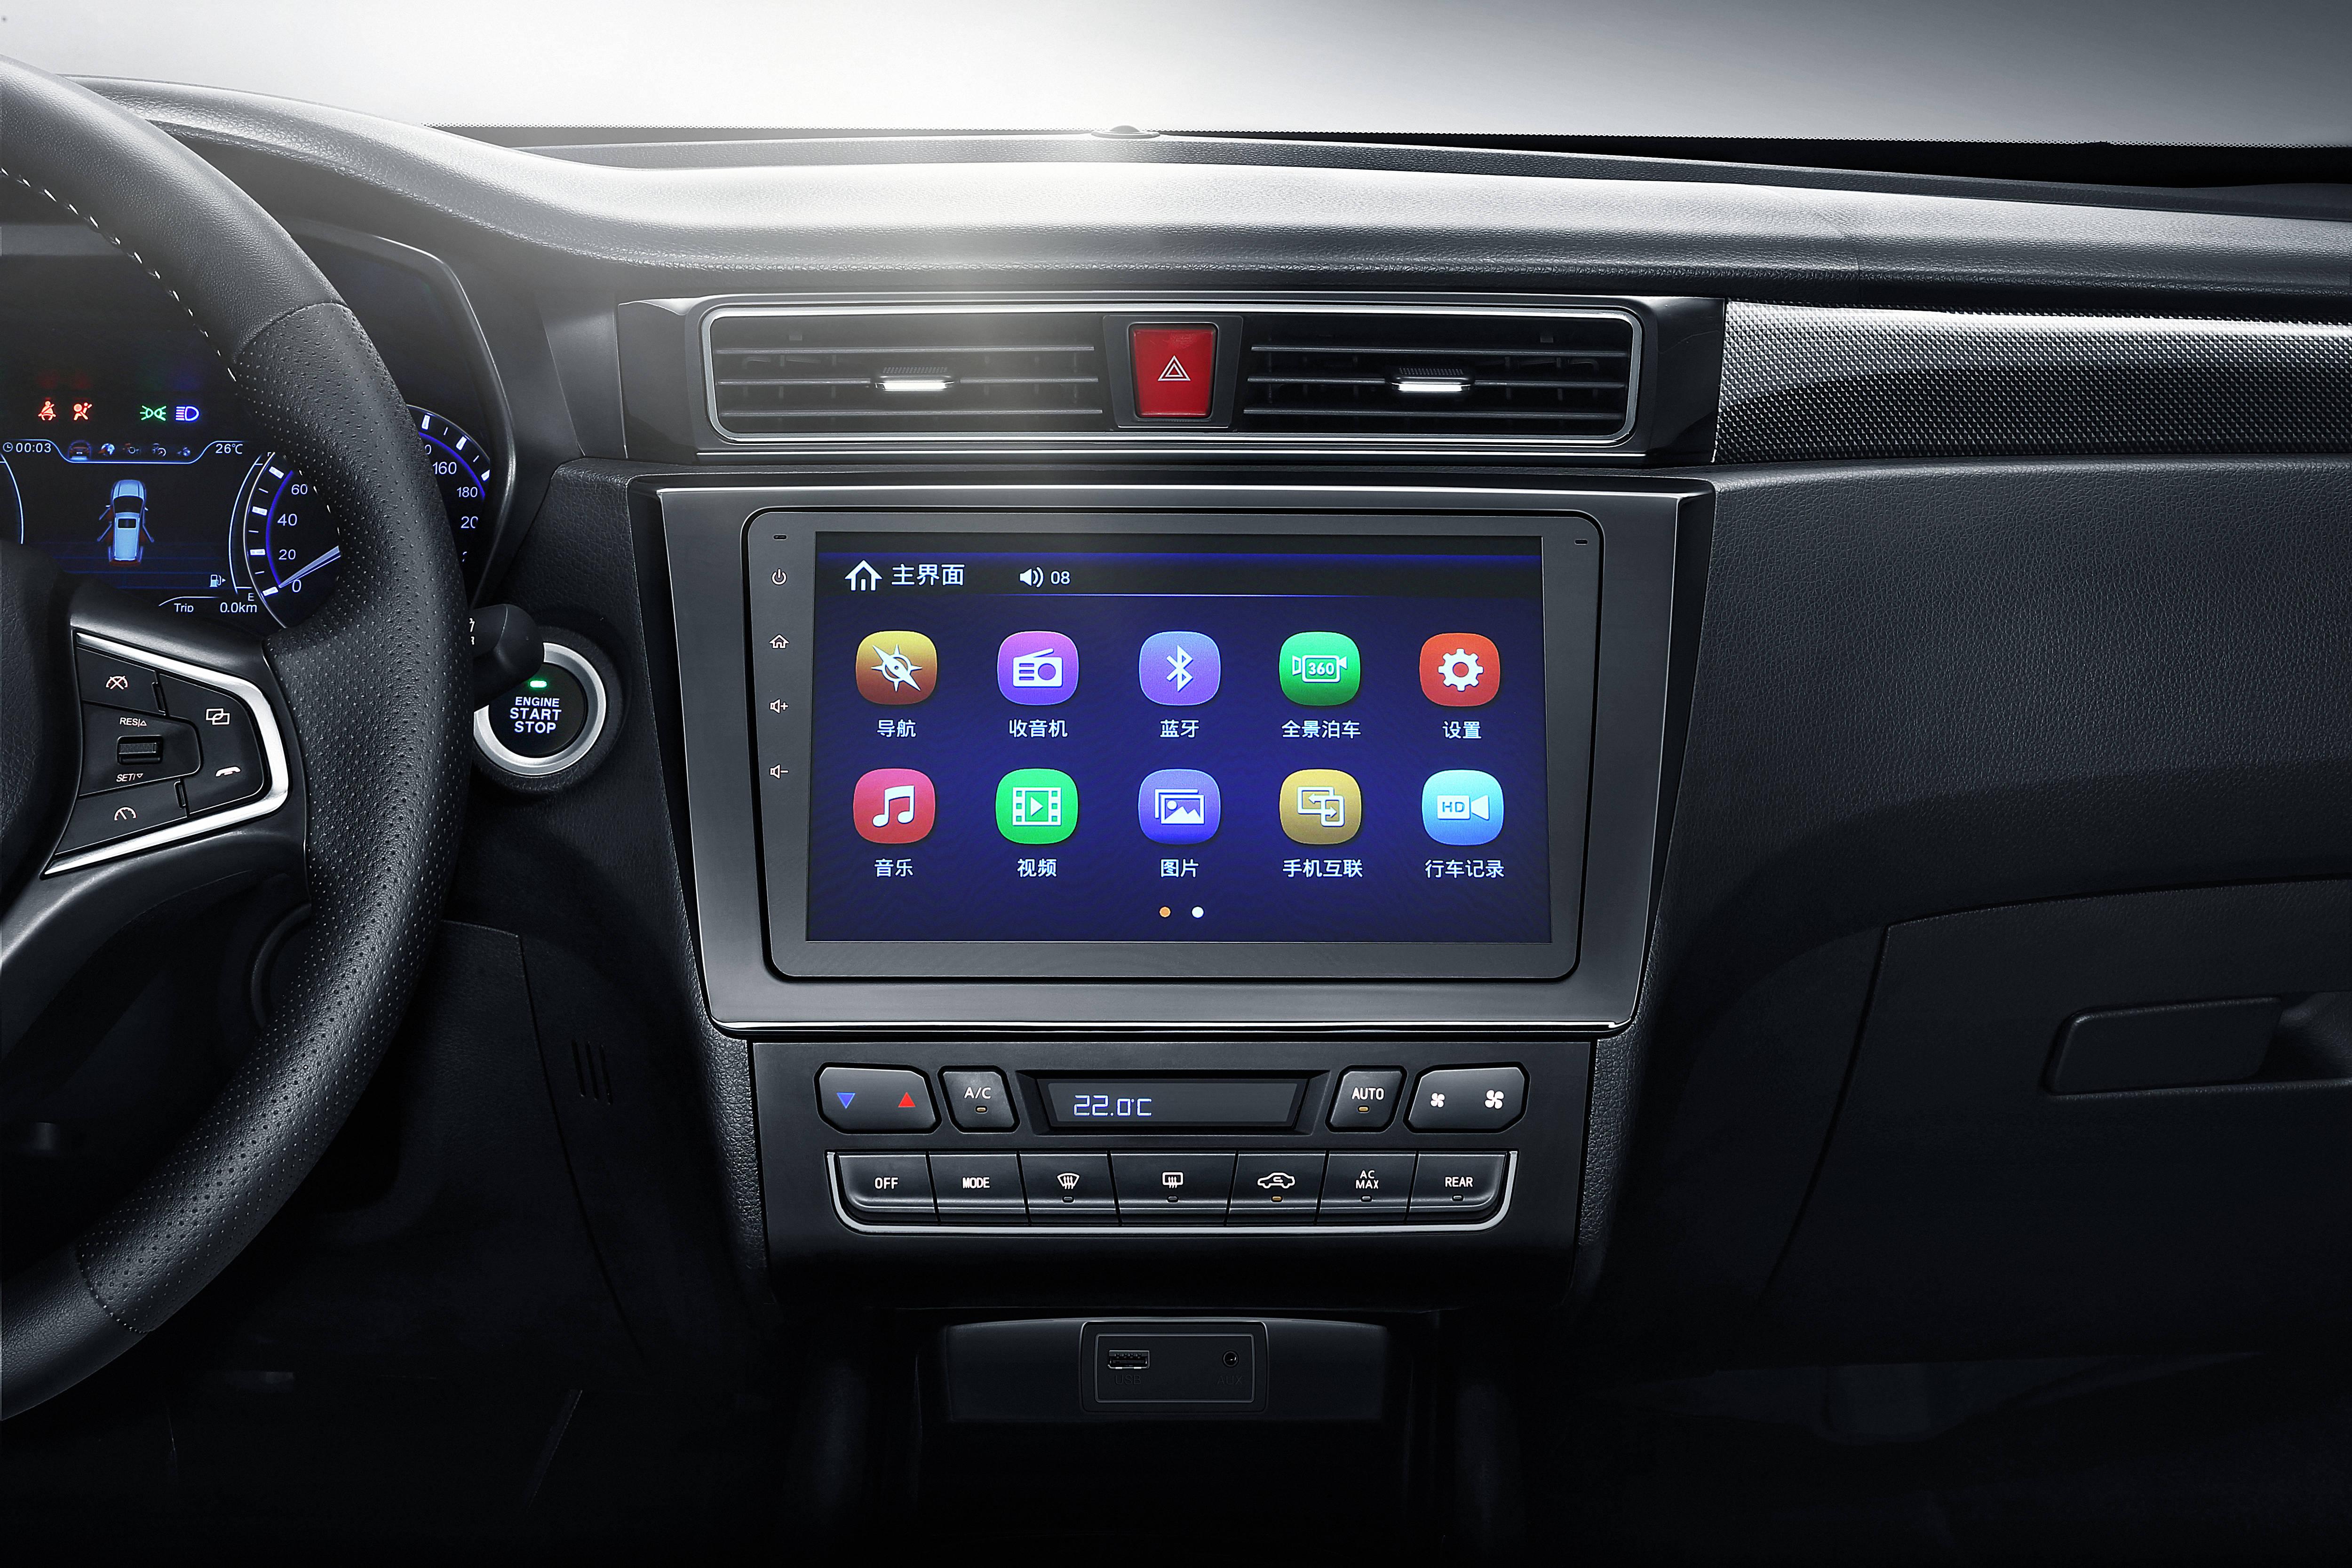 interior-central-screen